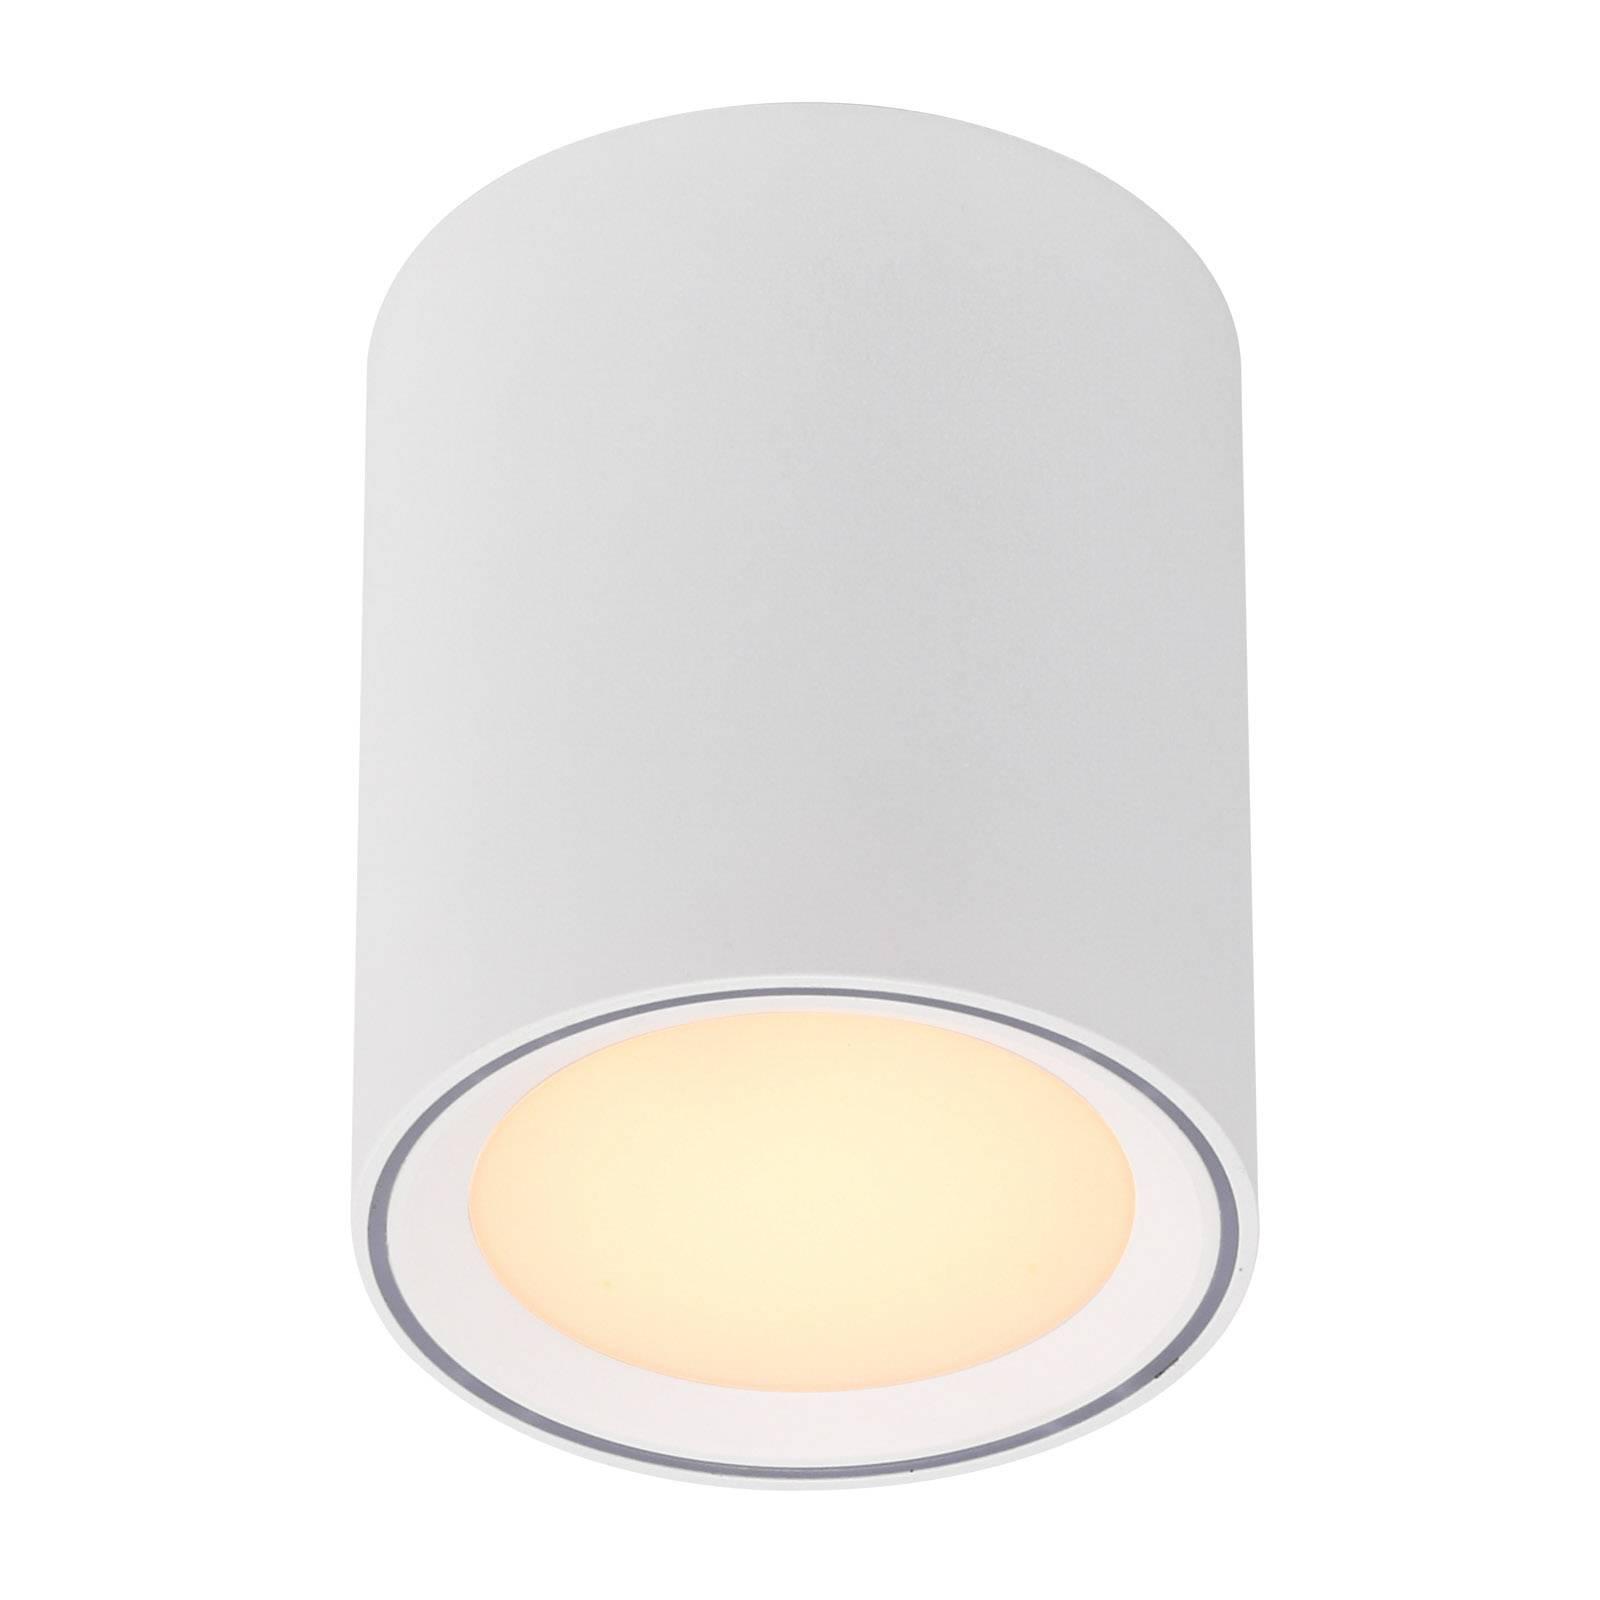 Fallon-LED-kattovalaisin, korkeus 12 cm